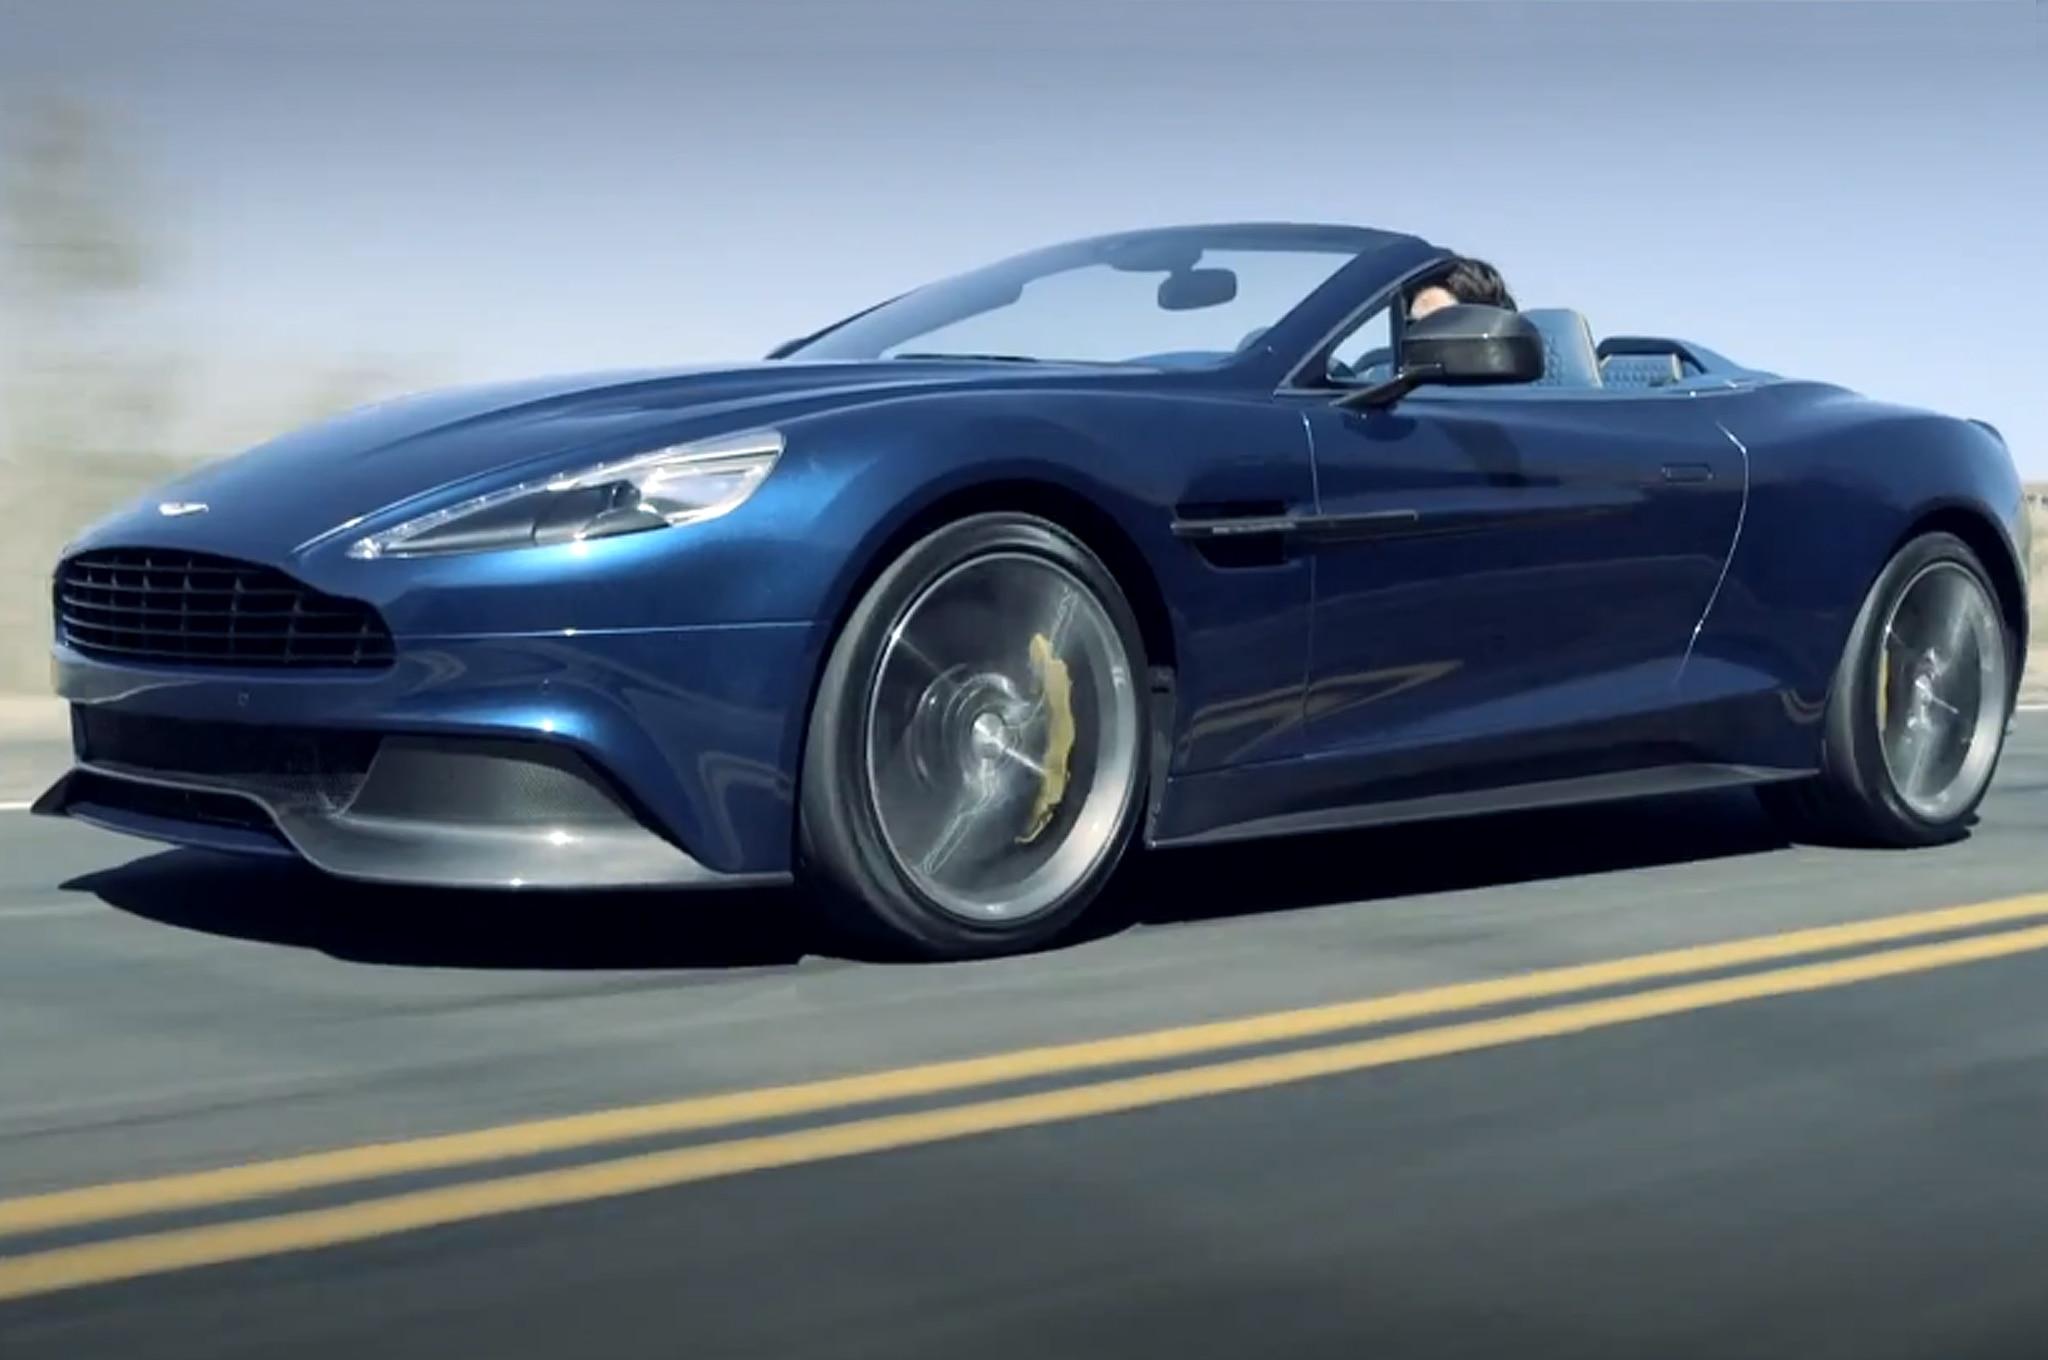 2014 Aston Martin Vanquish Volante Front Three Quarter13